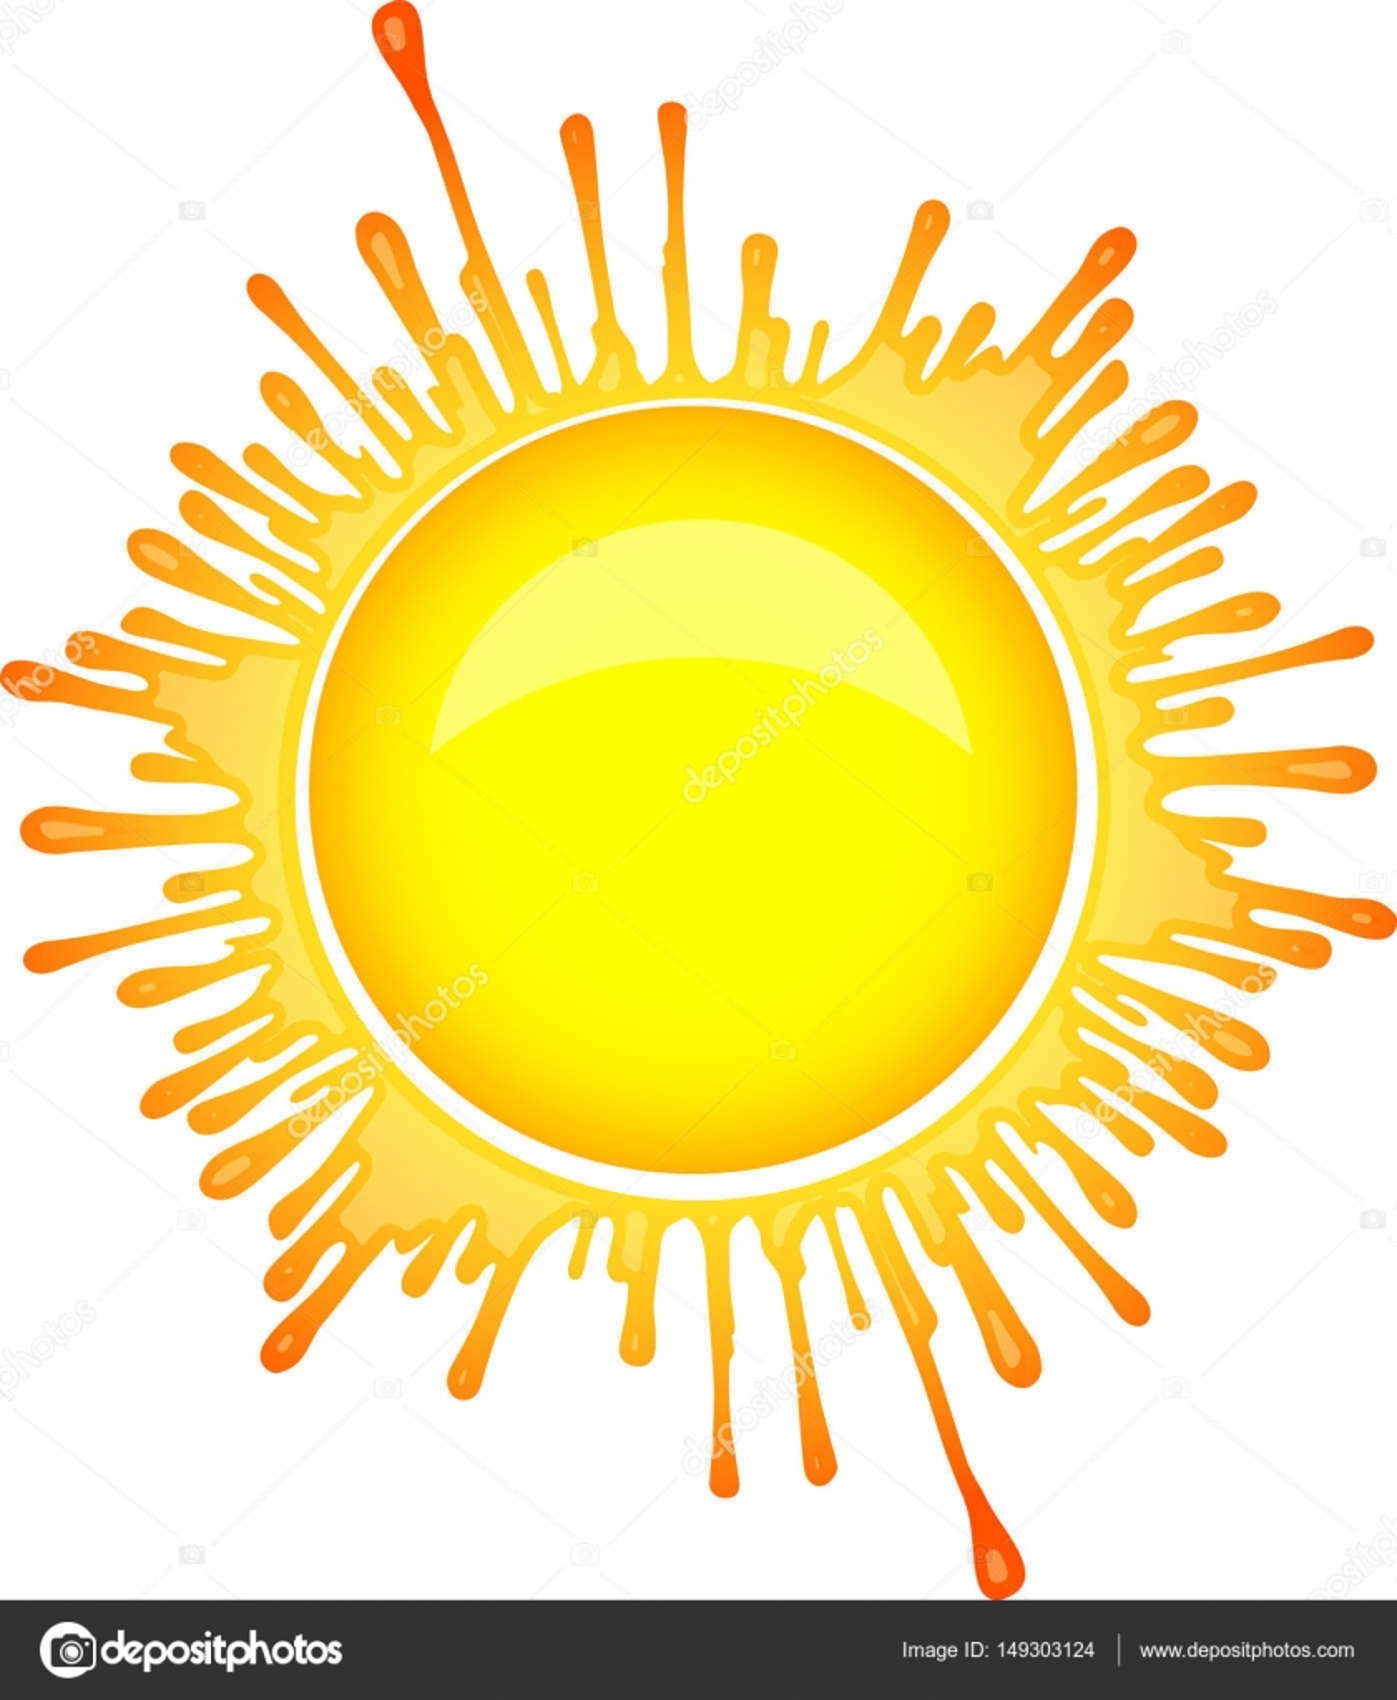 Sun symbol in inkblot style stock vector antonshpak 149303124 colorful bright sun symbol in inkblot style vector by antonshpak buycottarizona Images